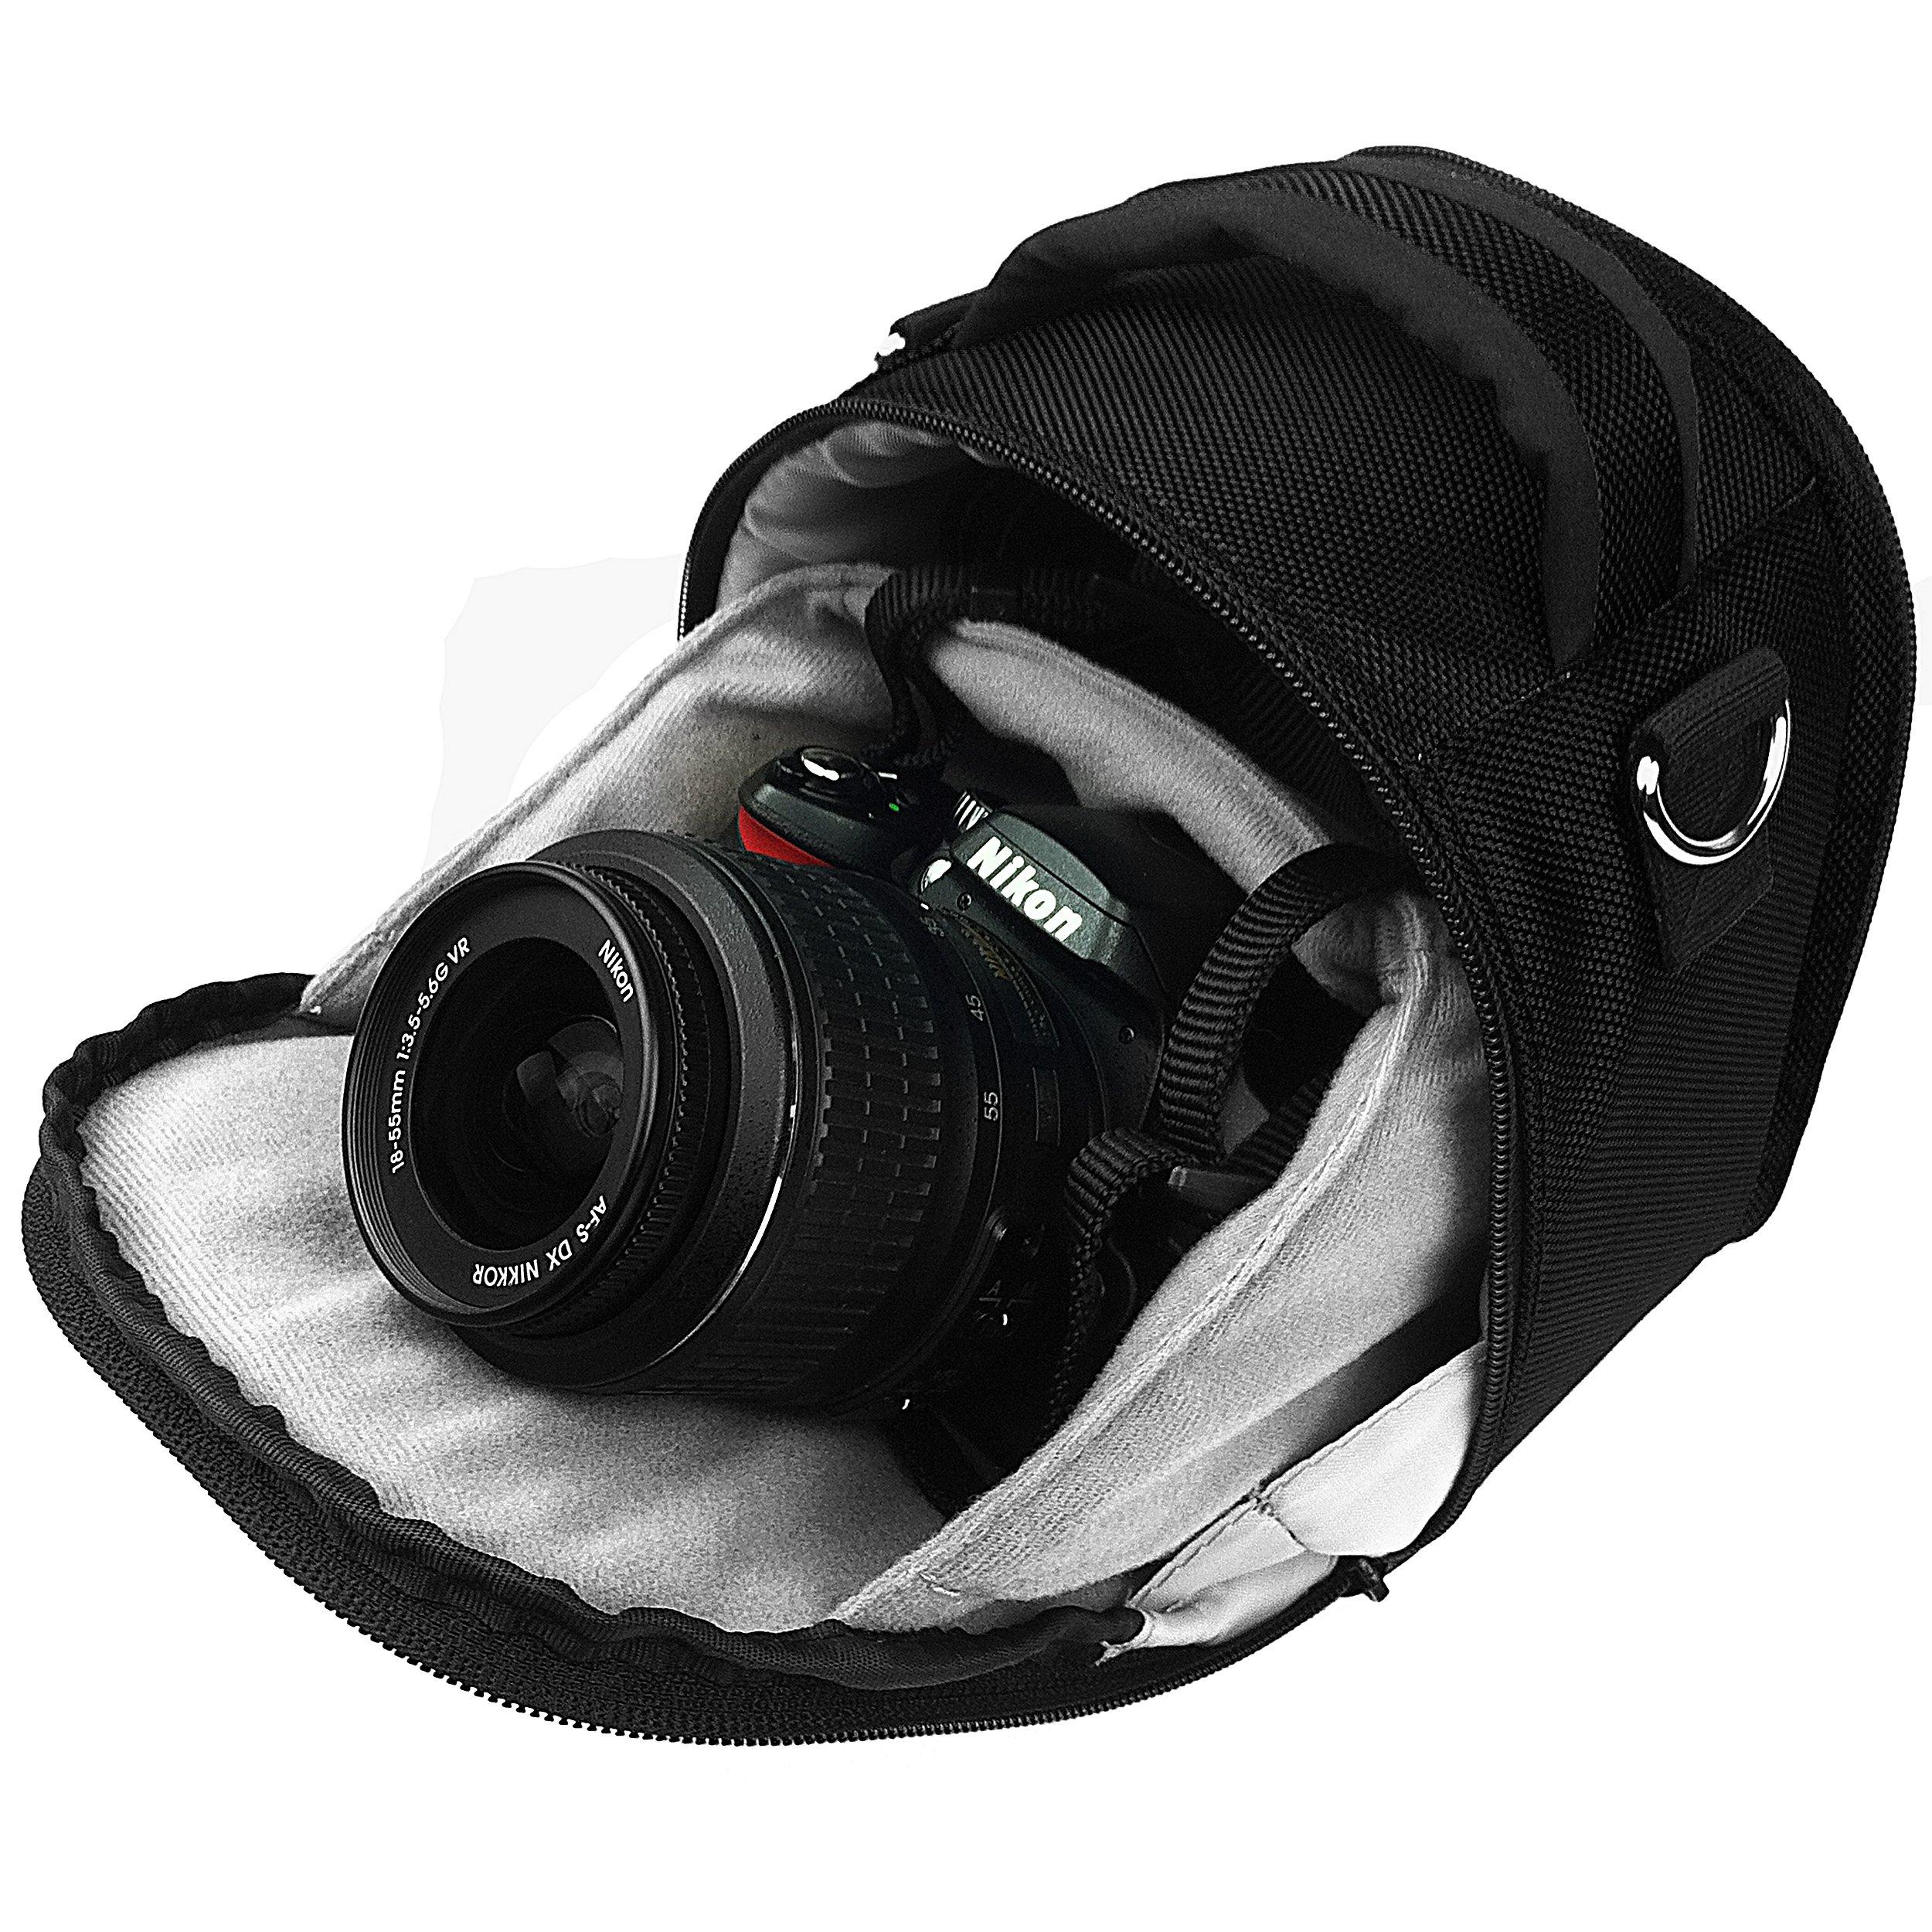 VanGoddy Laurel Carrying Handbag for Fujifilm FinePix S9800 Digital Camera by Vangoddy (Image #5)